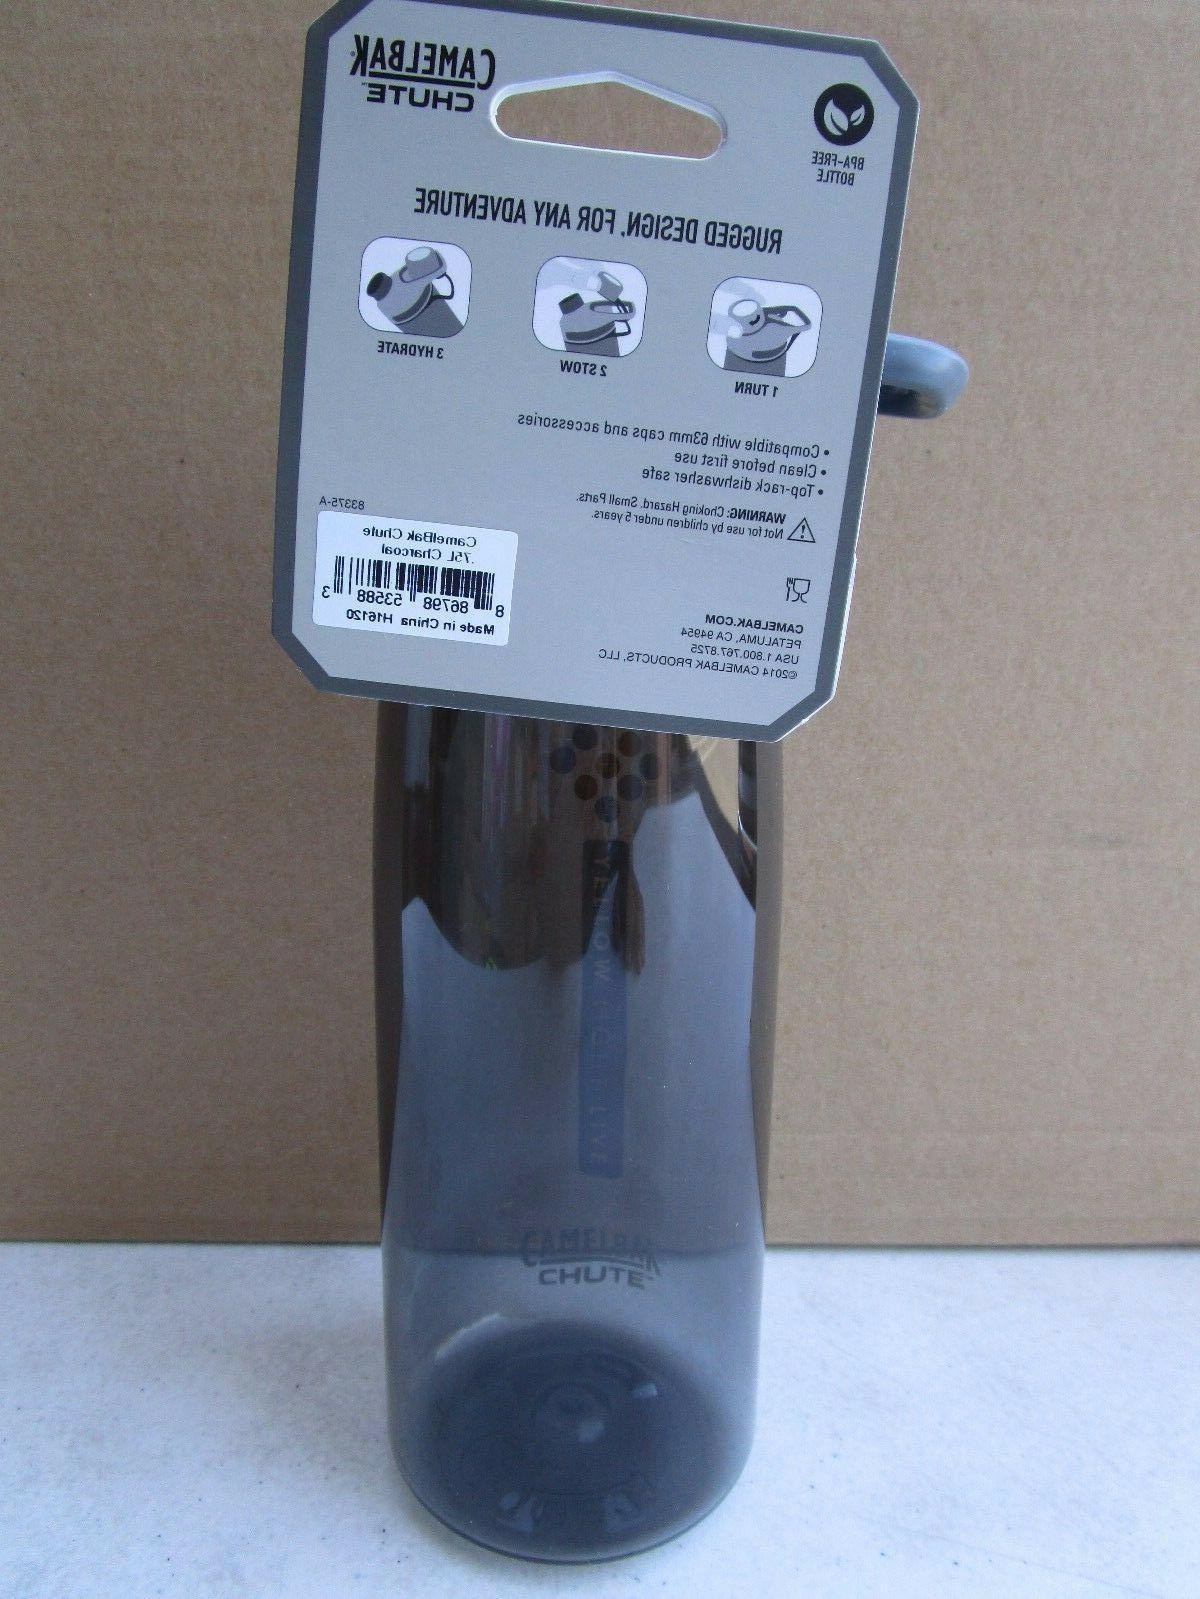 CAMELBAK CHUTE 0.75L water H16120 black .75 liter